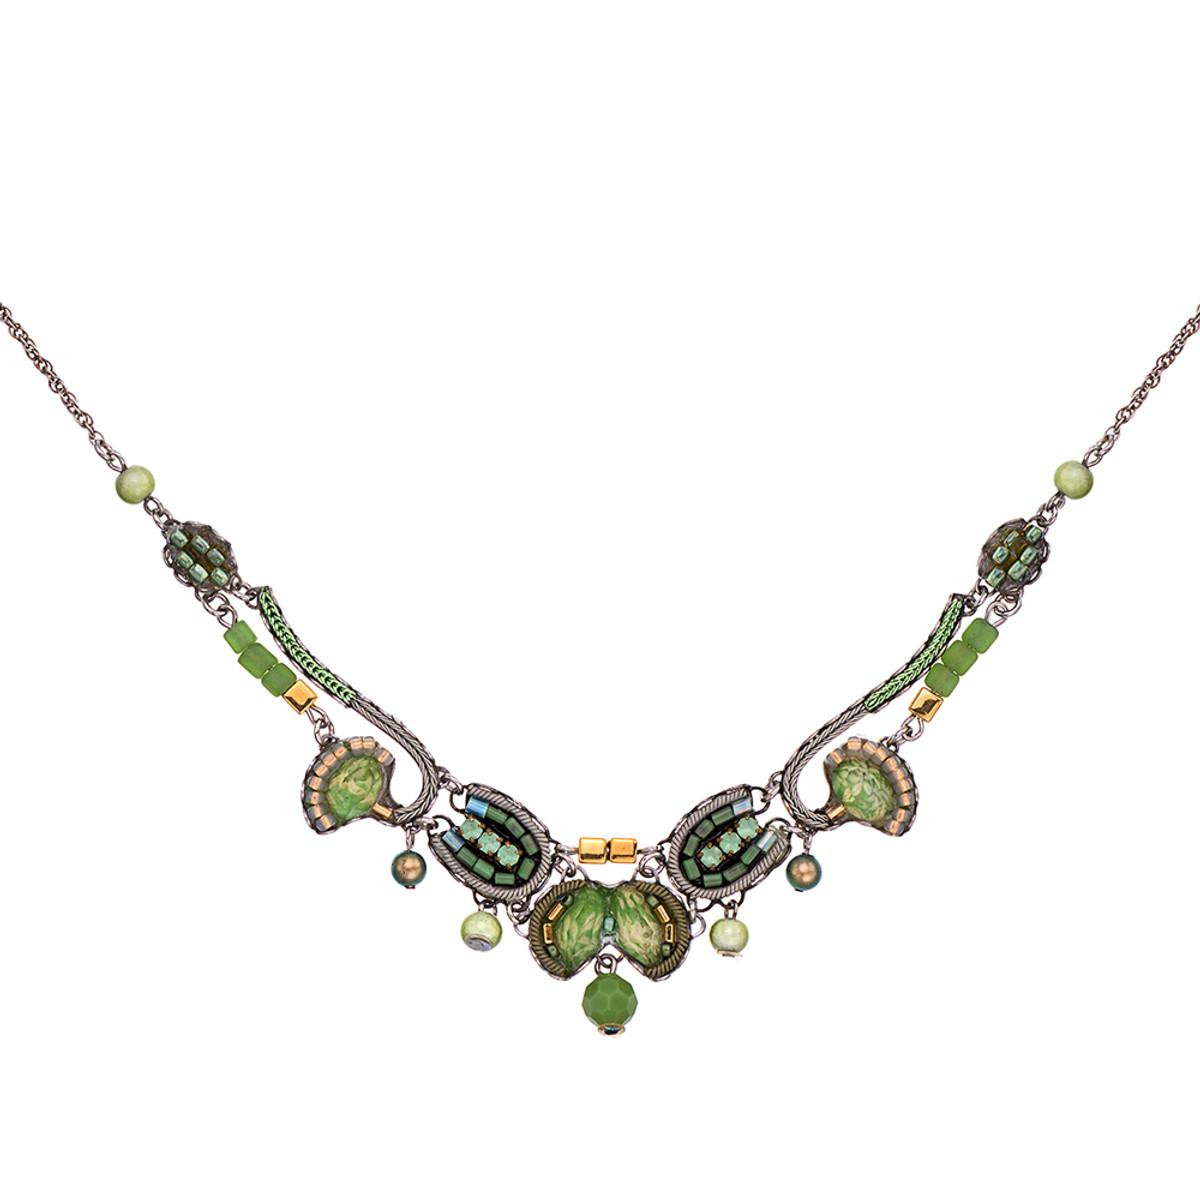 Ayala Bar Green Moonlight Wonder Necklace